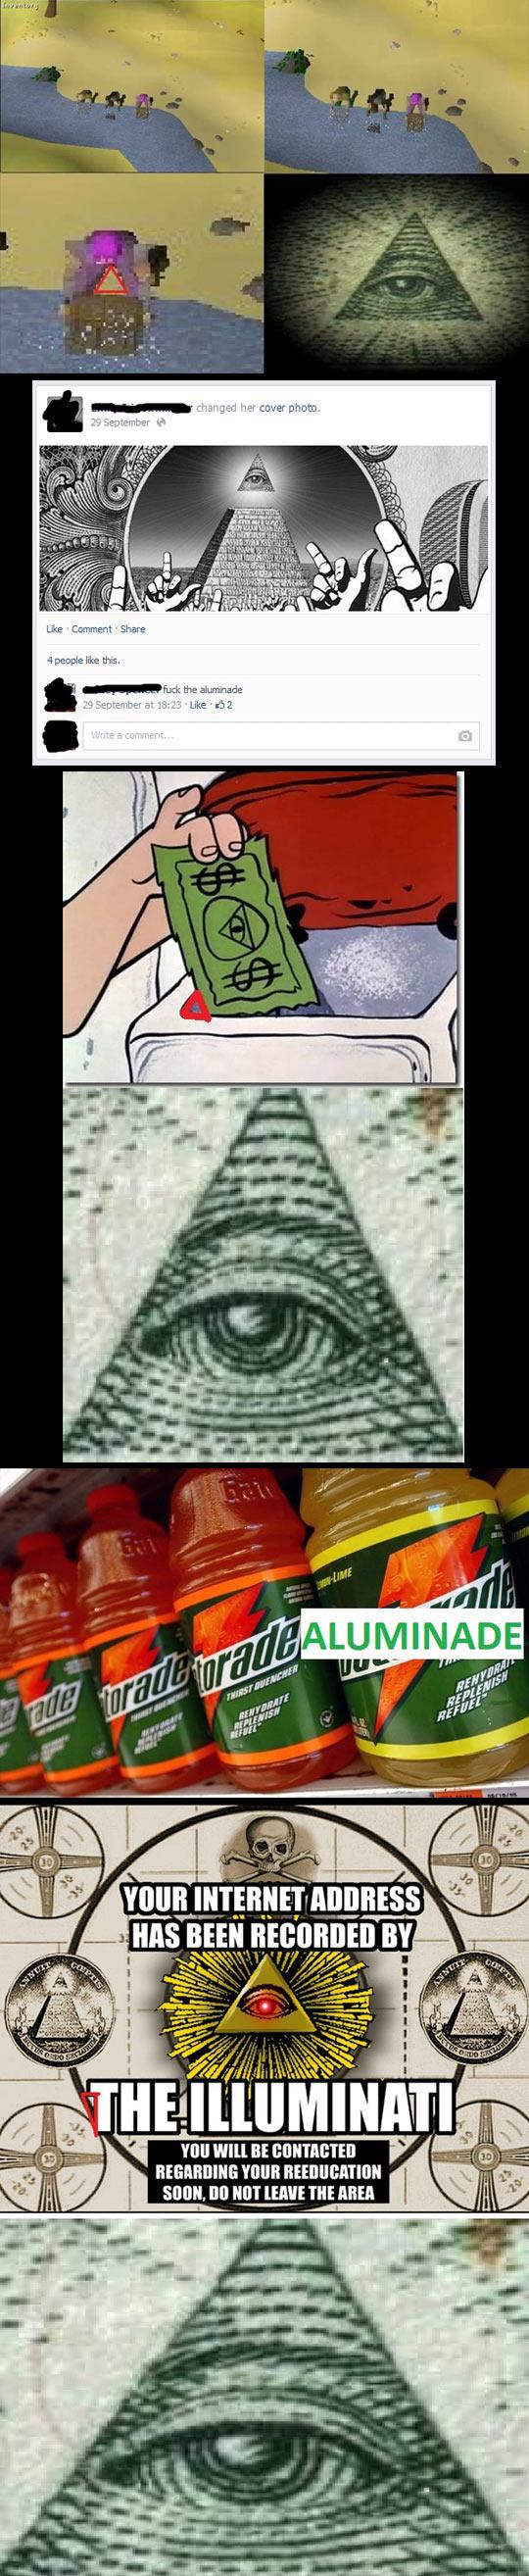 funny-Illuminati-conspiracy-triangle-games-dollar-signal